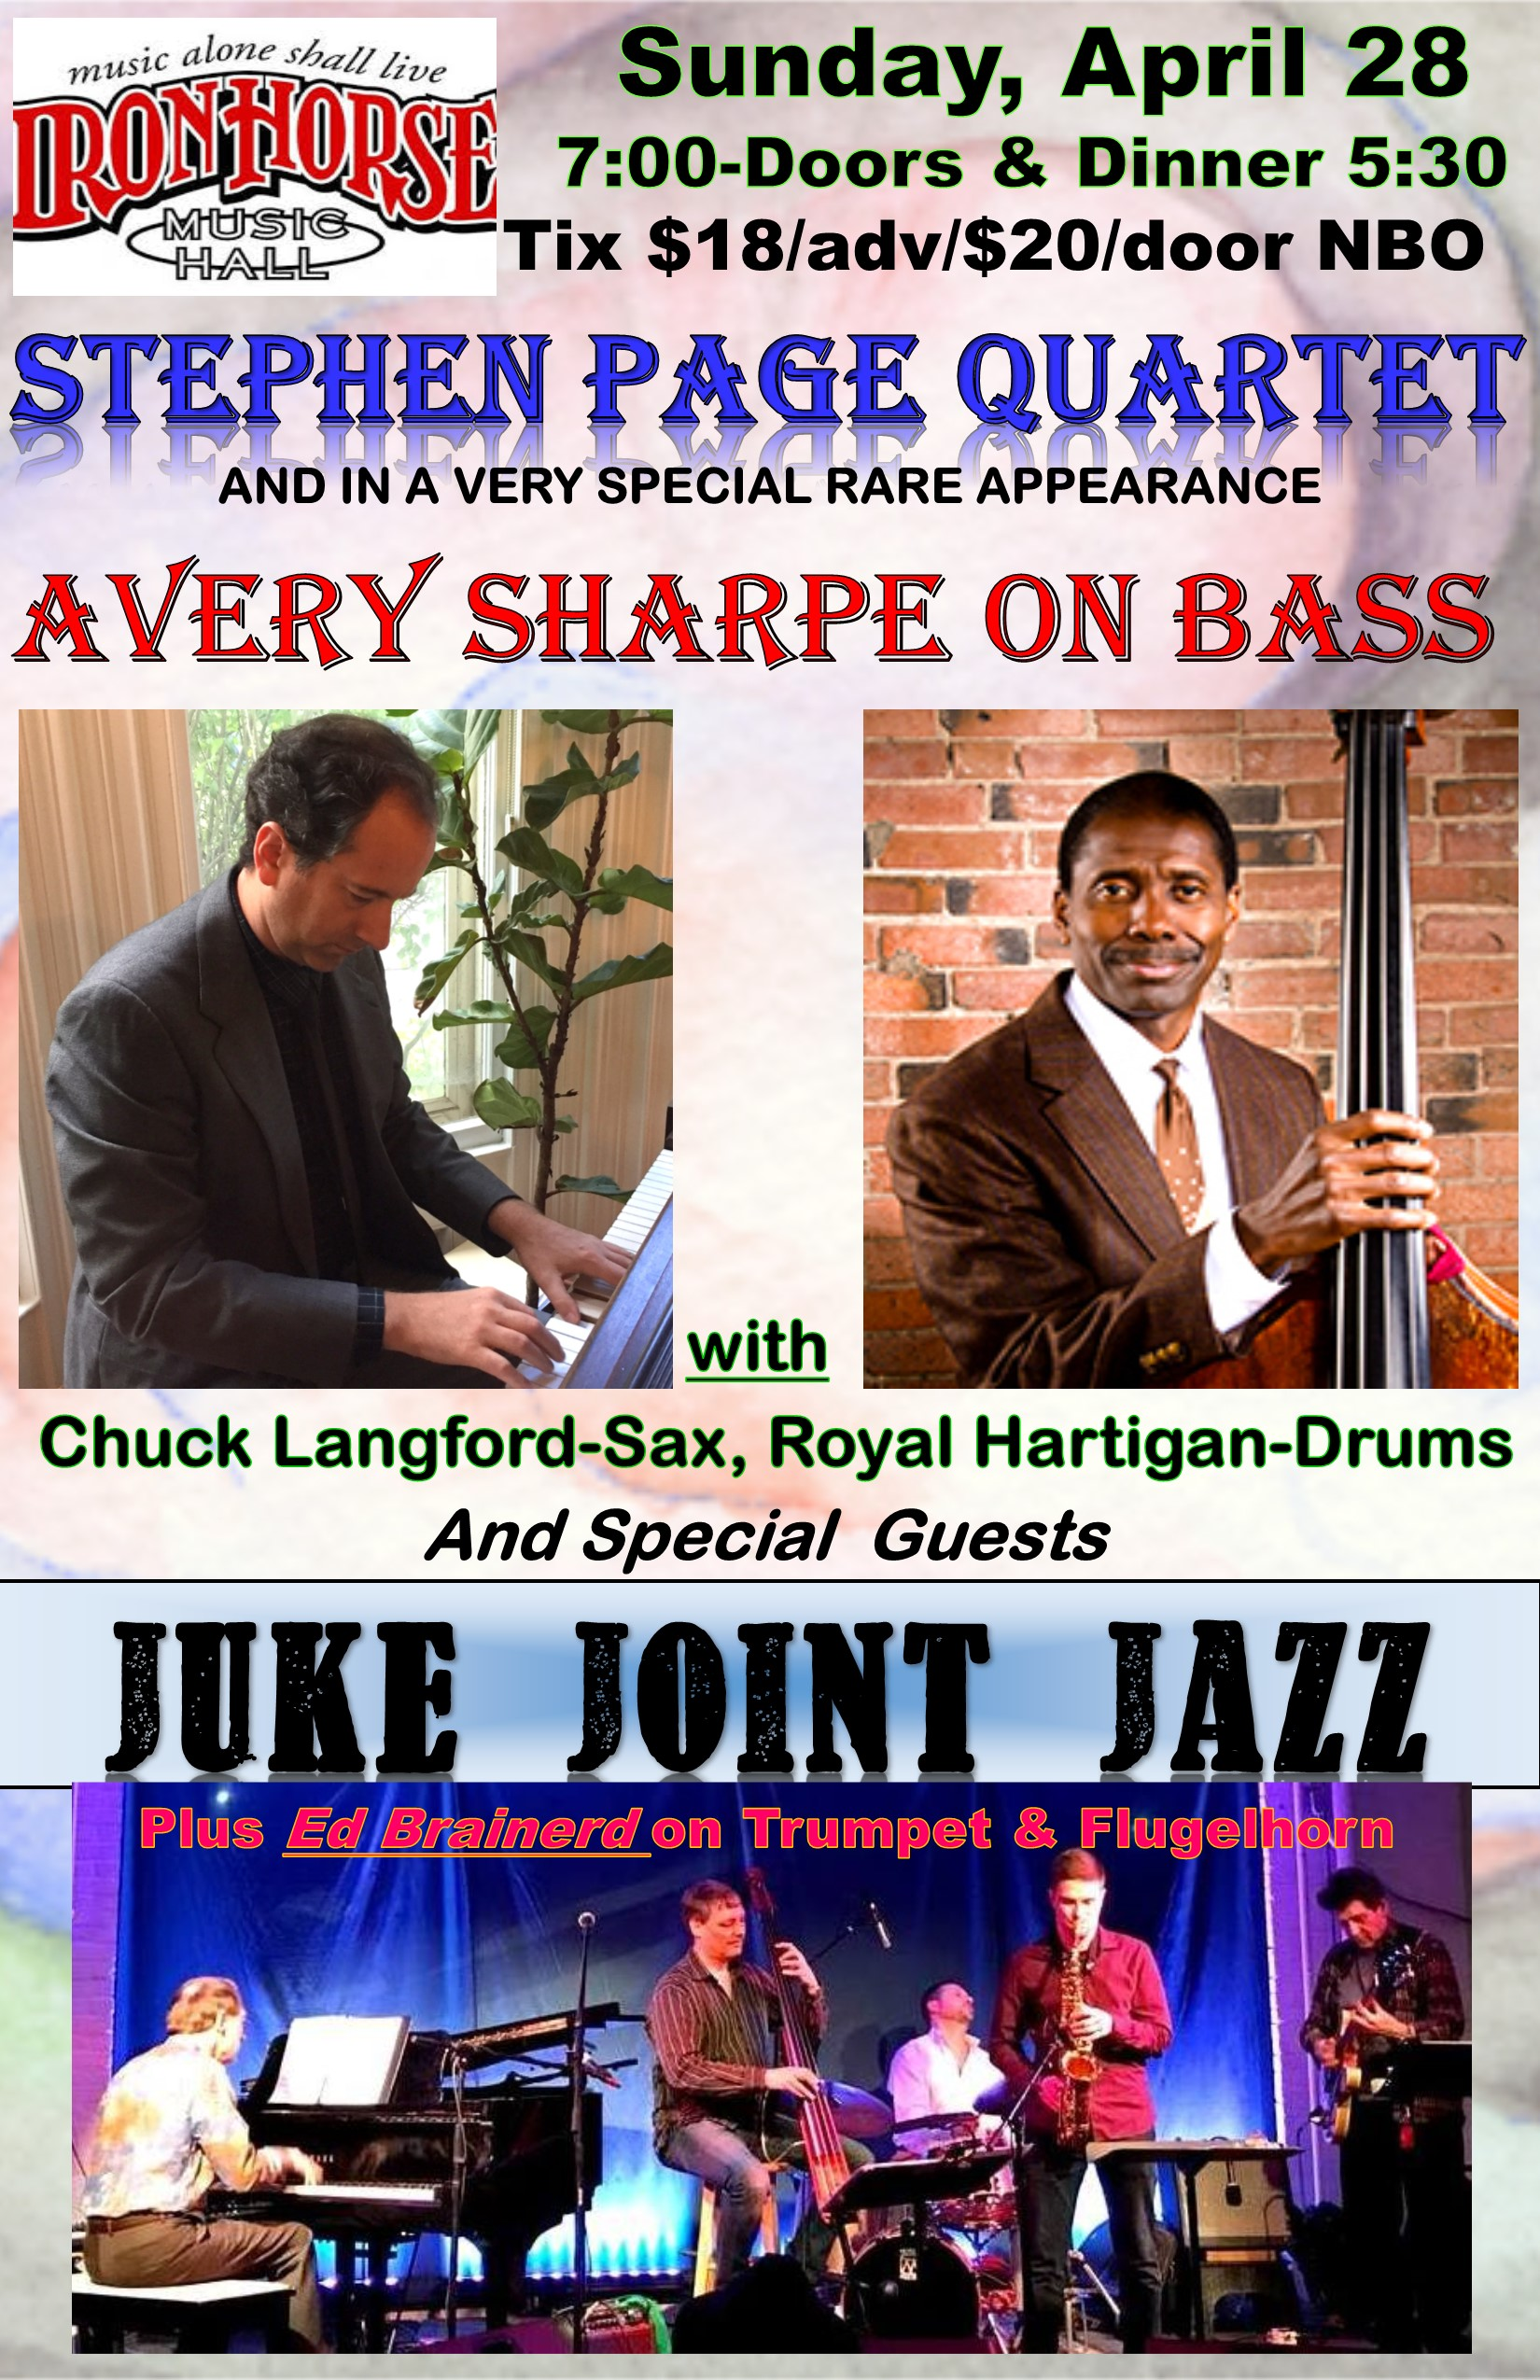 Stephen Page Quartet Feat. Avery Sharpe Plus Juke Joint Jazz